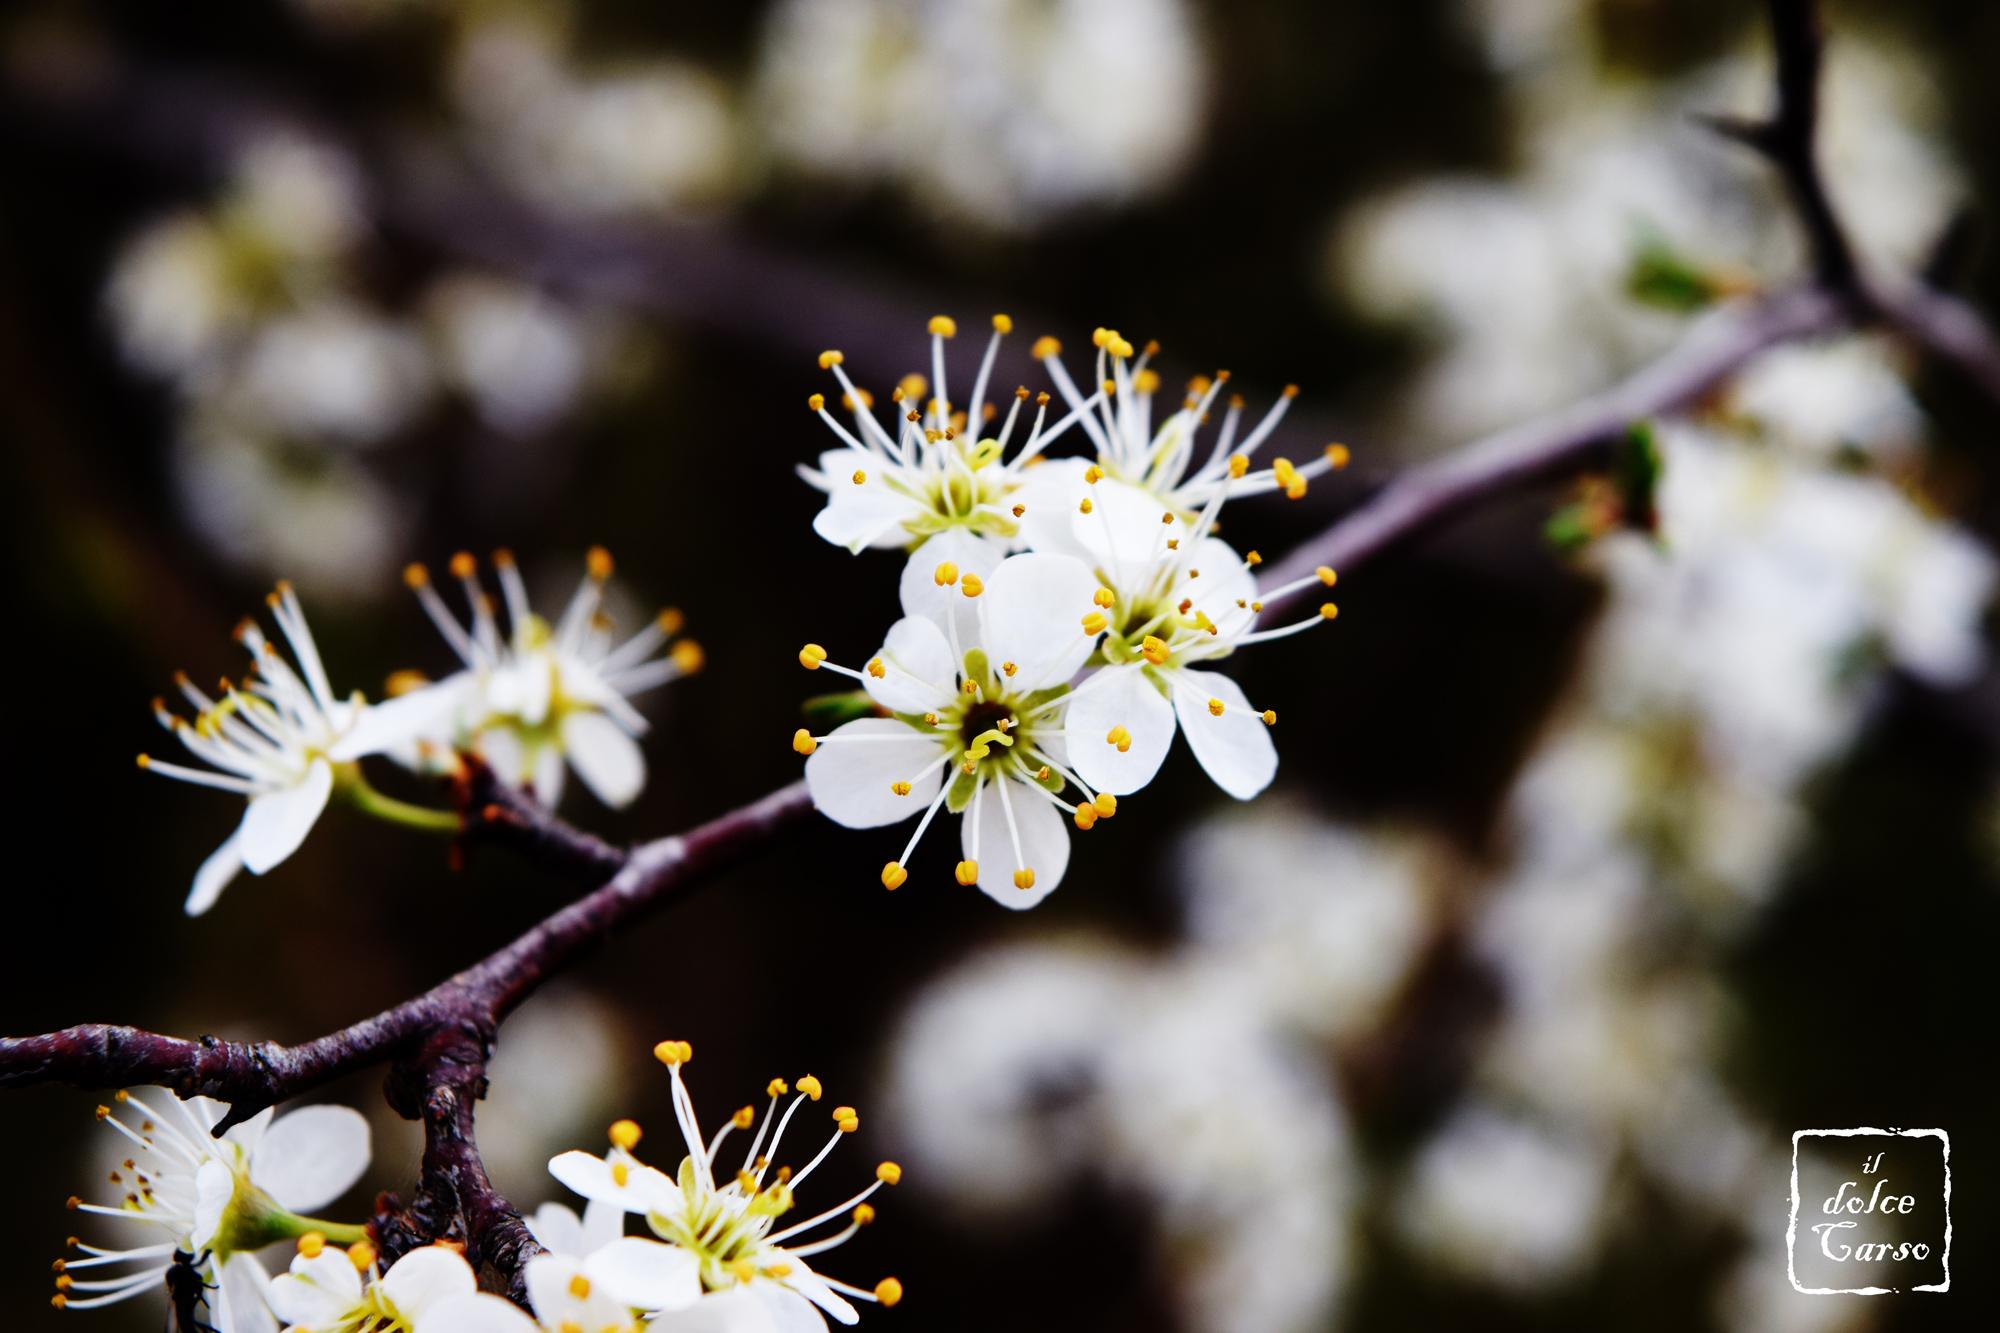 Ciliegio canino (Prunus mahaleb)